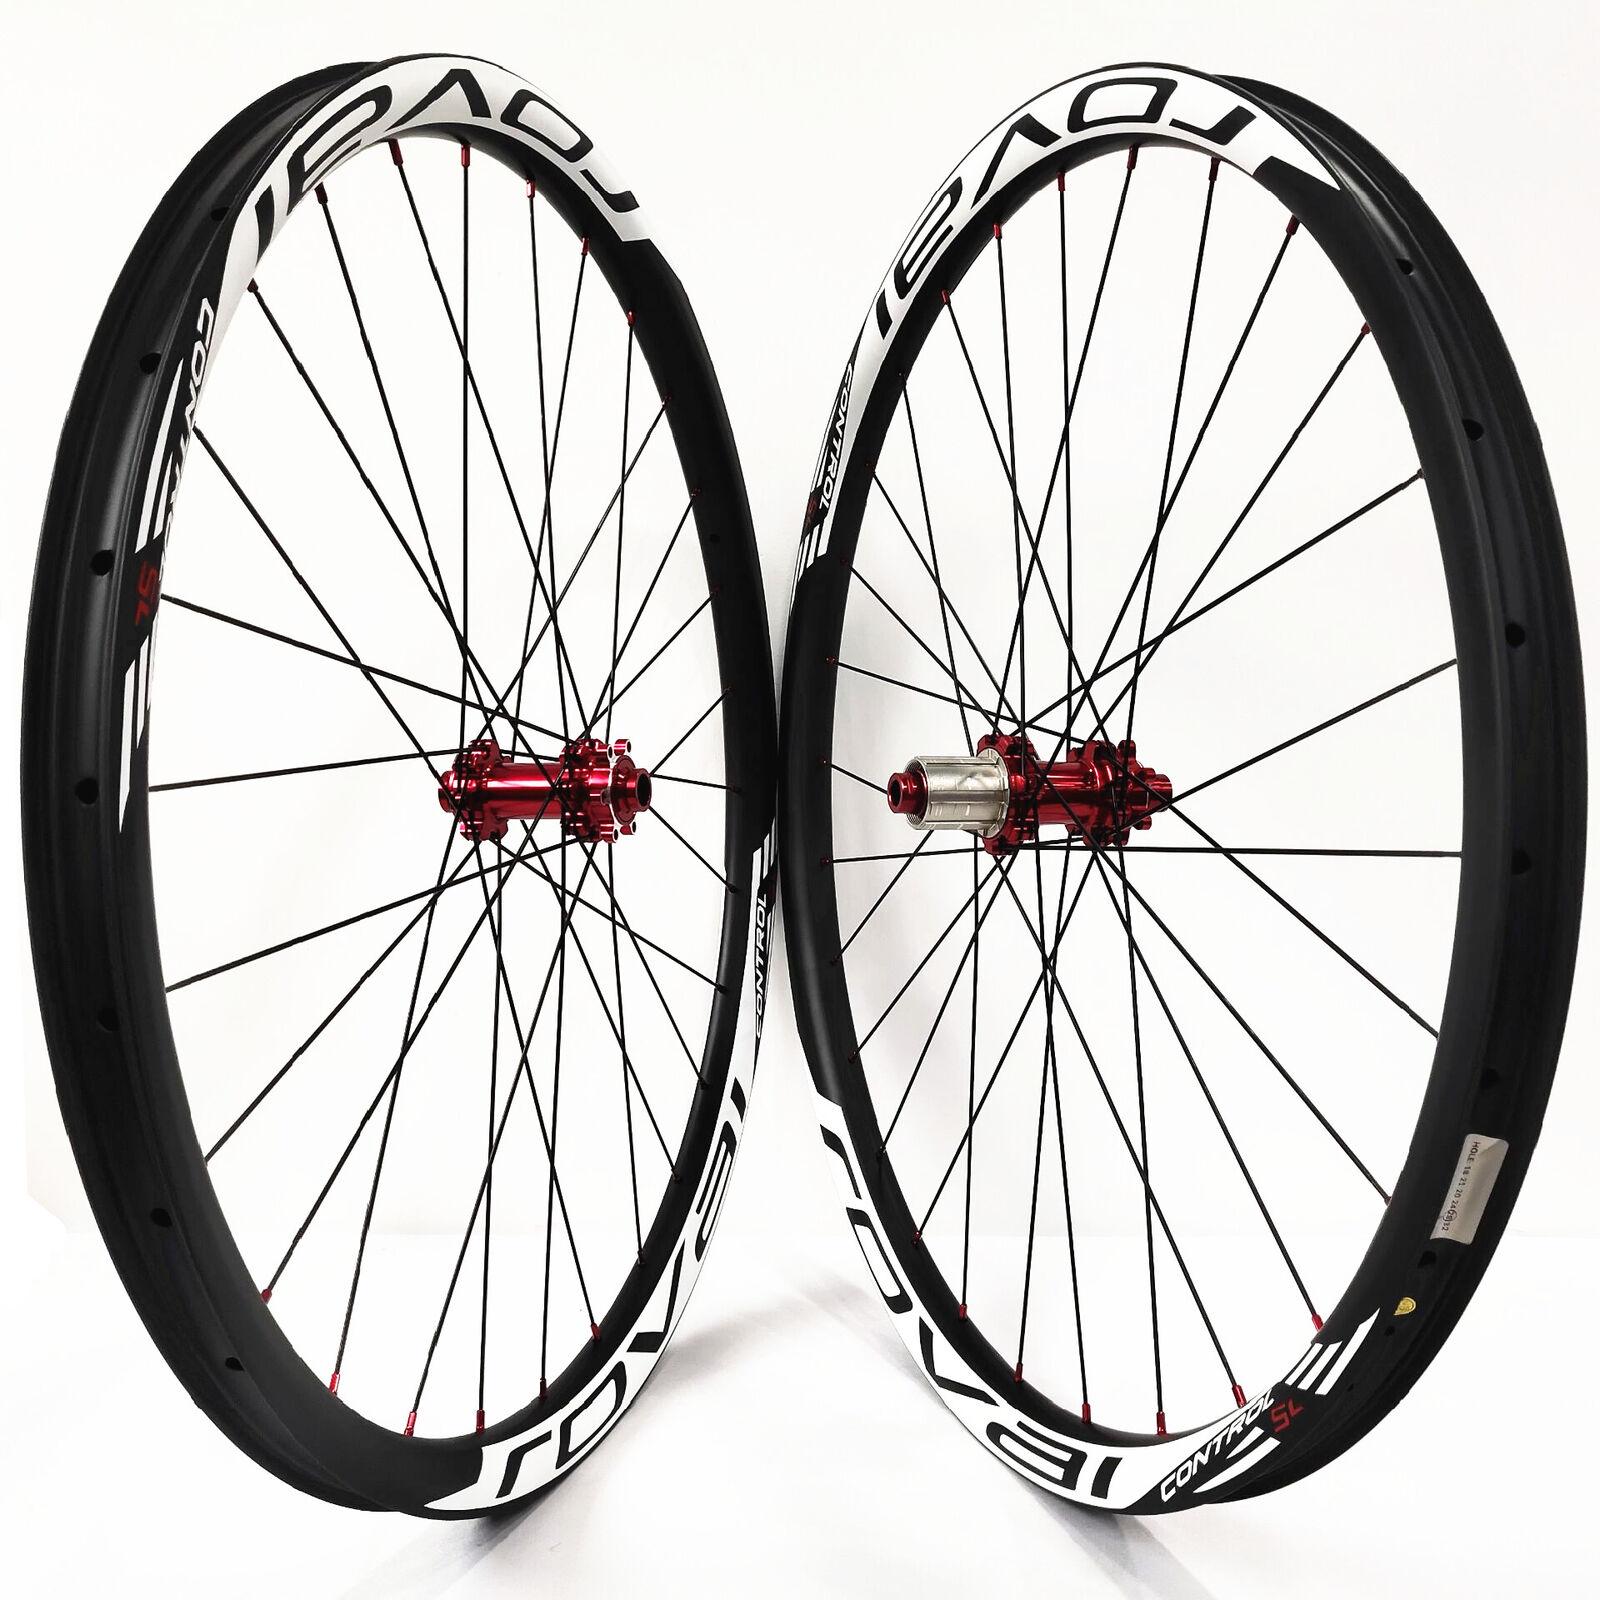 29er MTB carbon Fiber wheels Asymmetrical 33mm mountain bike wheelset M42 hub